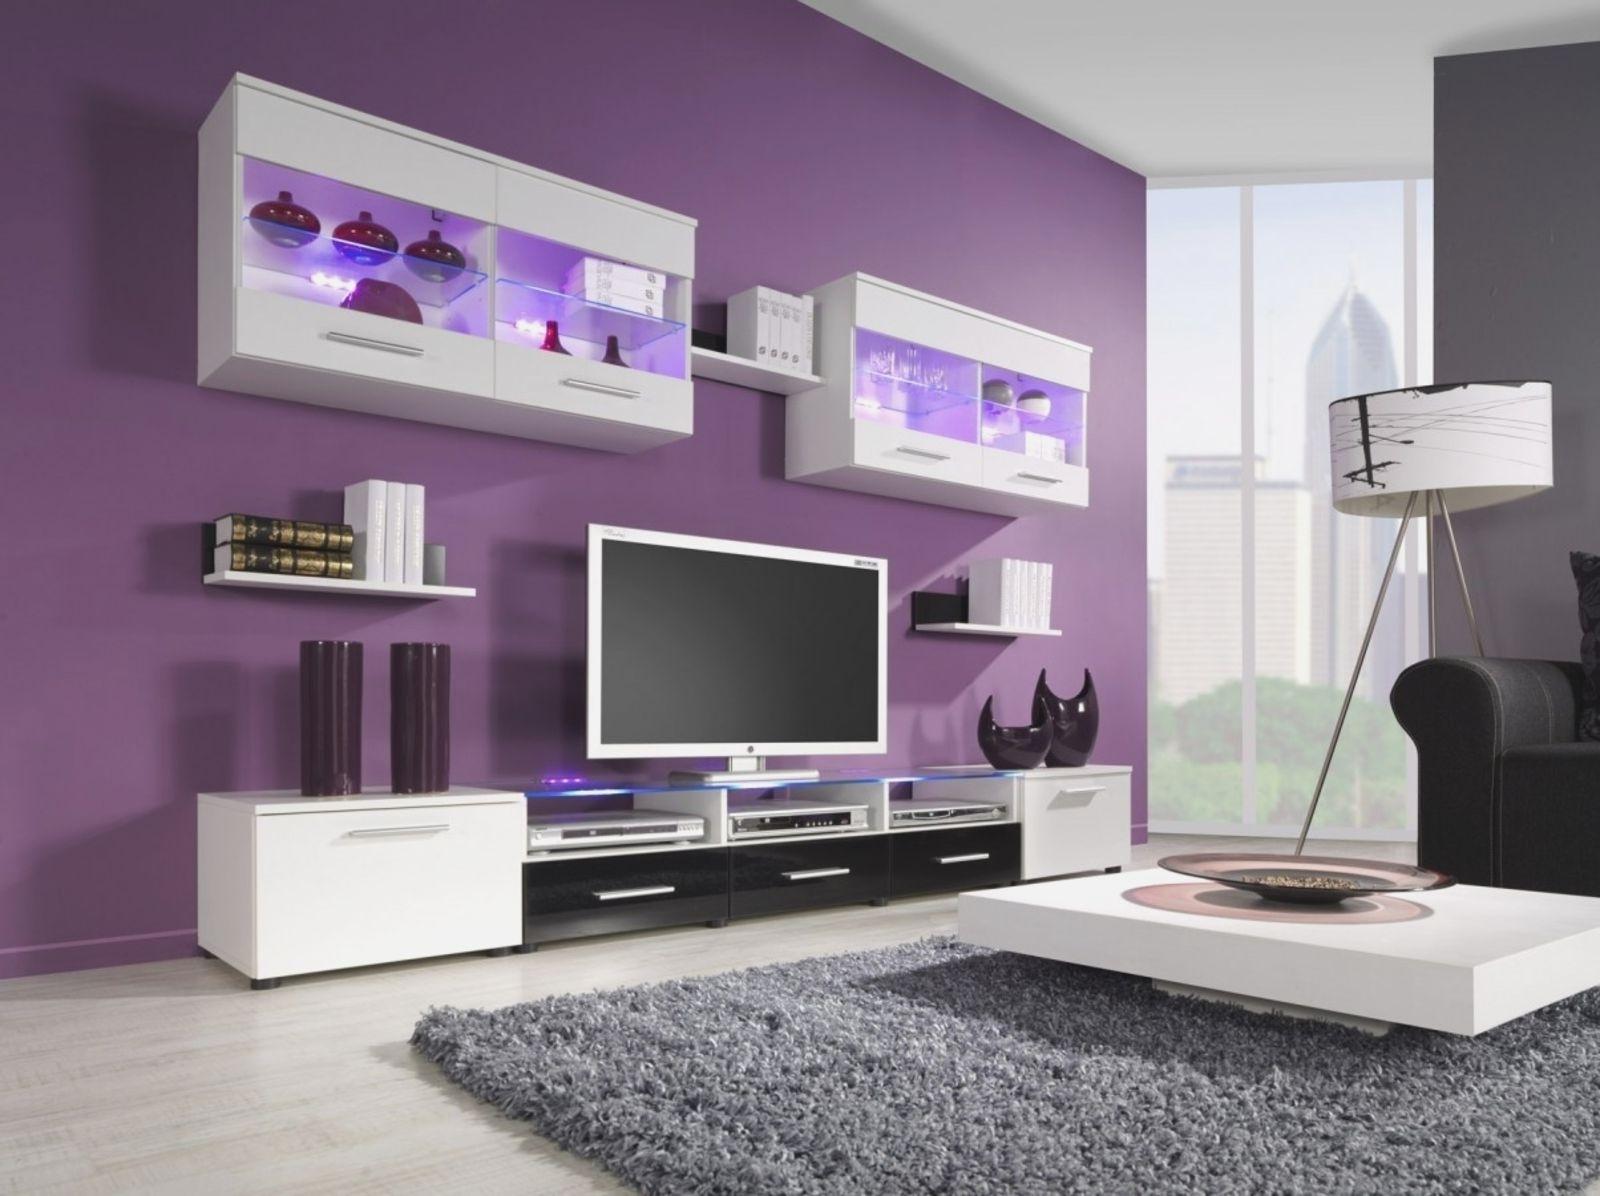 Gabungan warna ruang tamu ungu dan putih moden